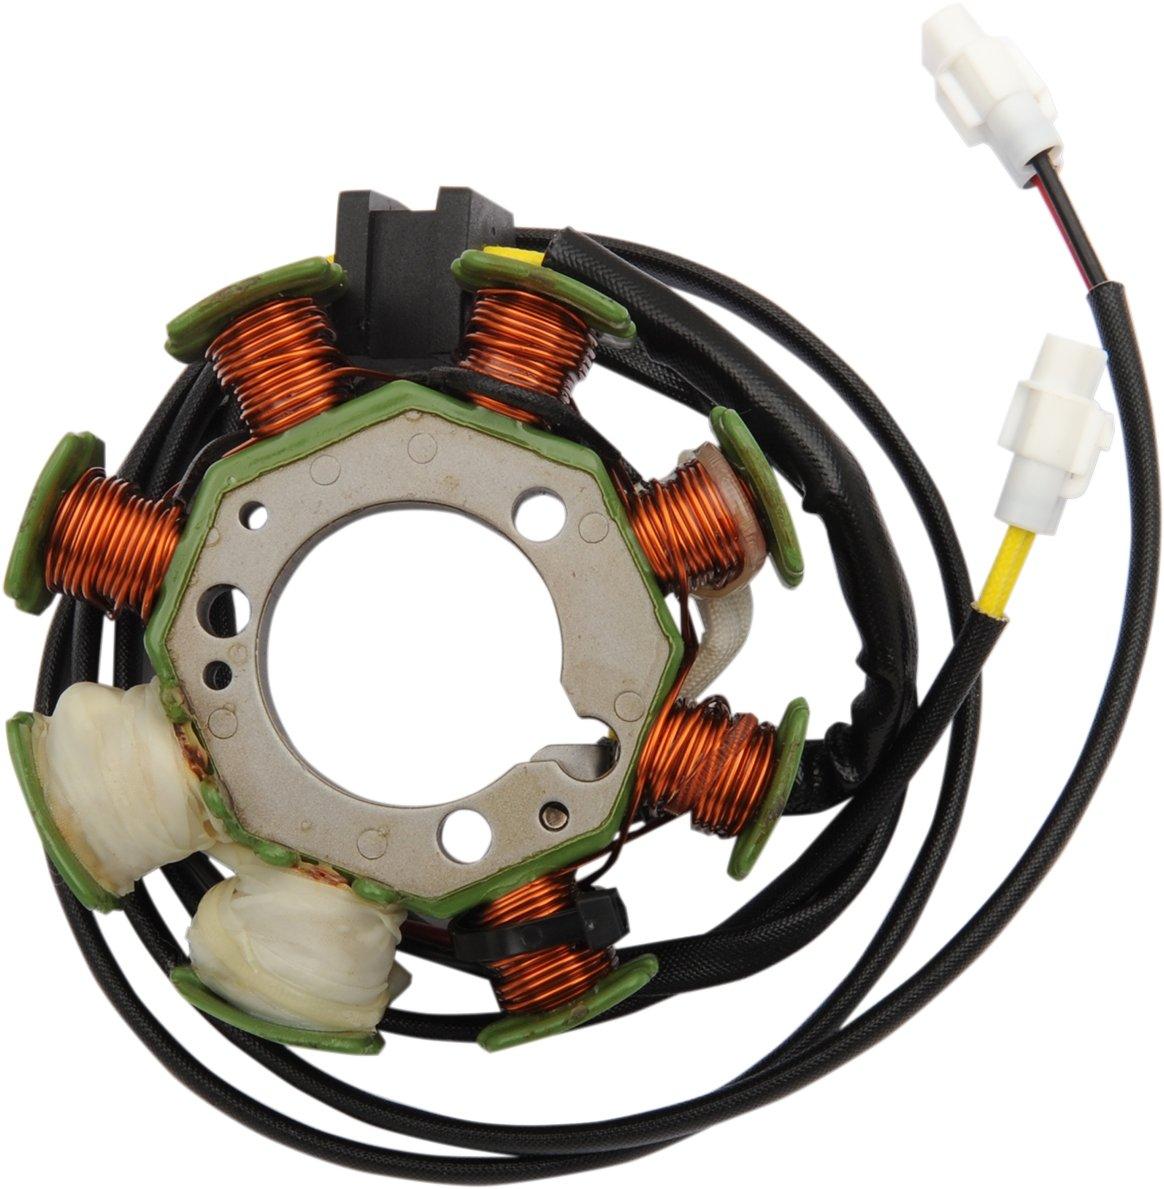 Ricks Motorsport Electric Stator 21721